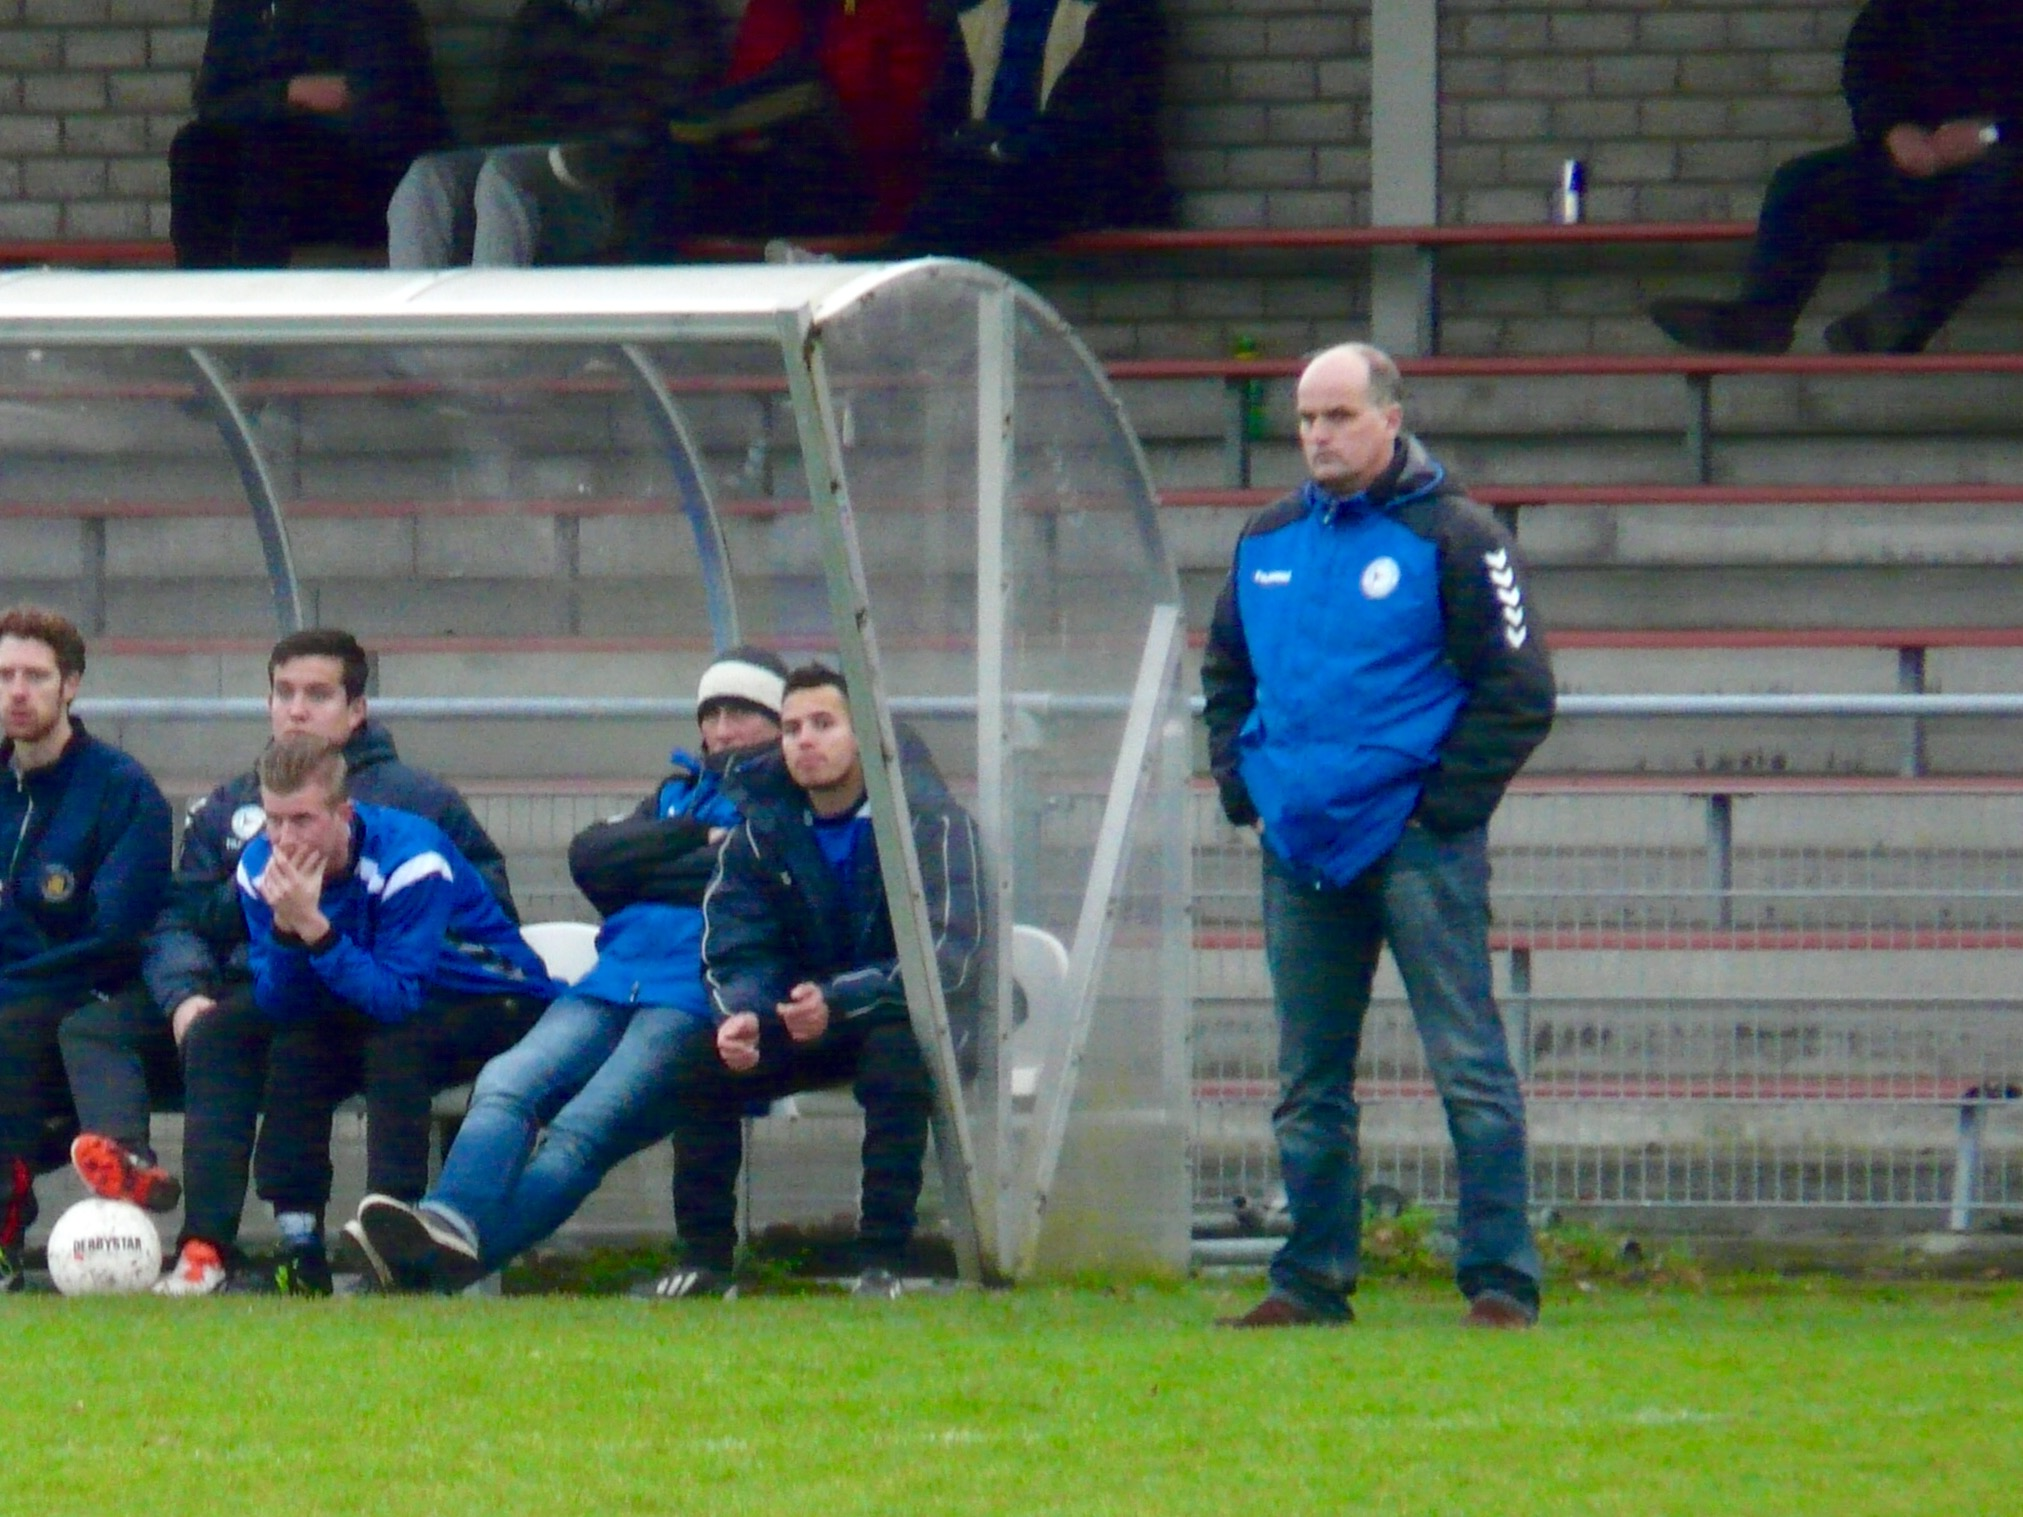 RCH - Hoogervorst - Voetbal in Haarlem